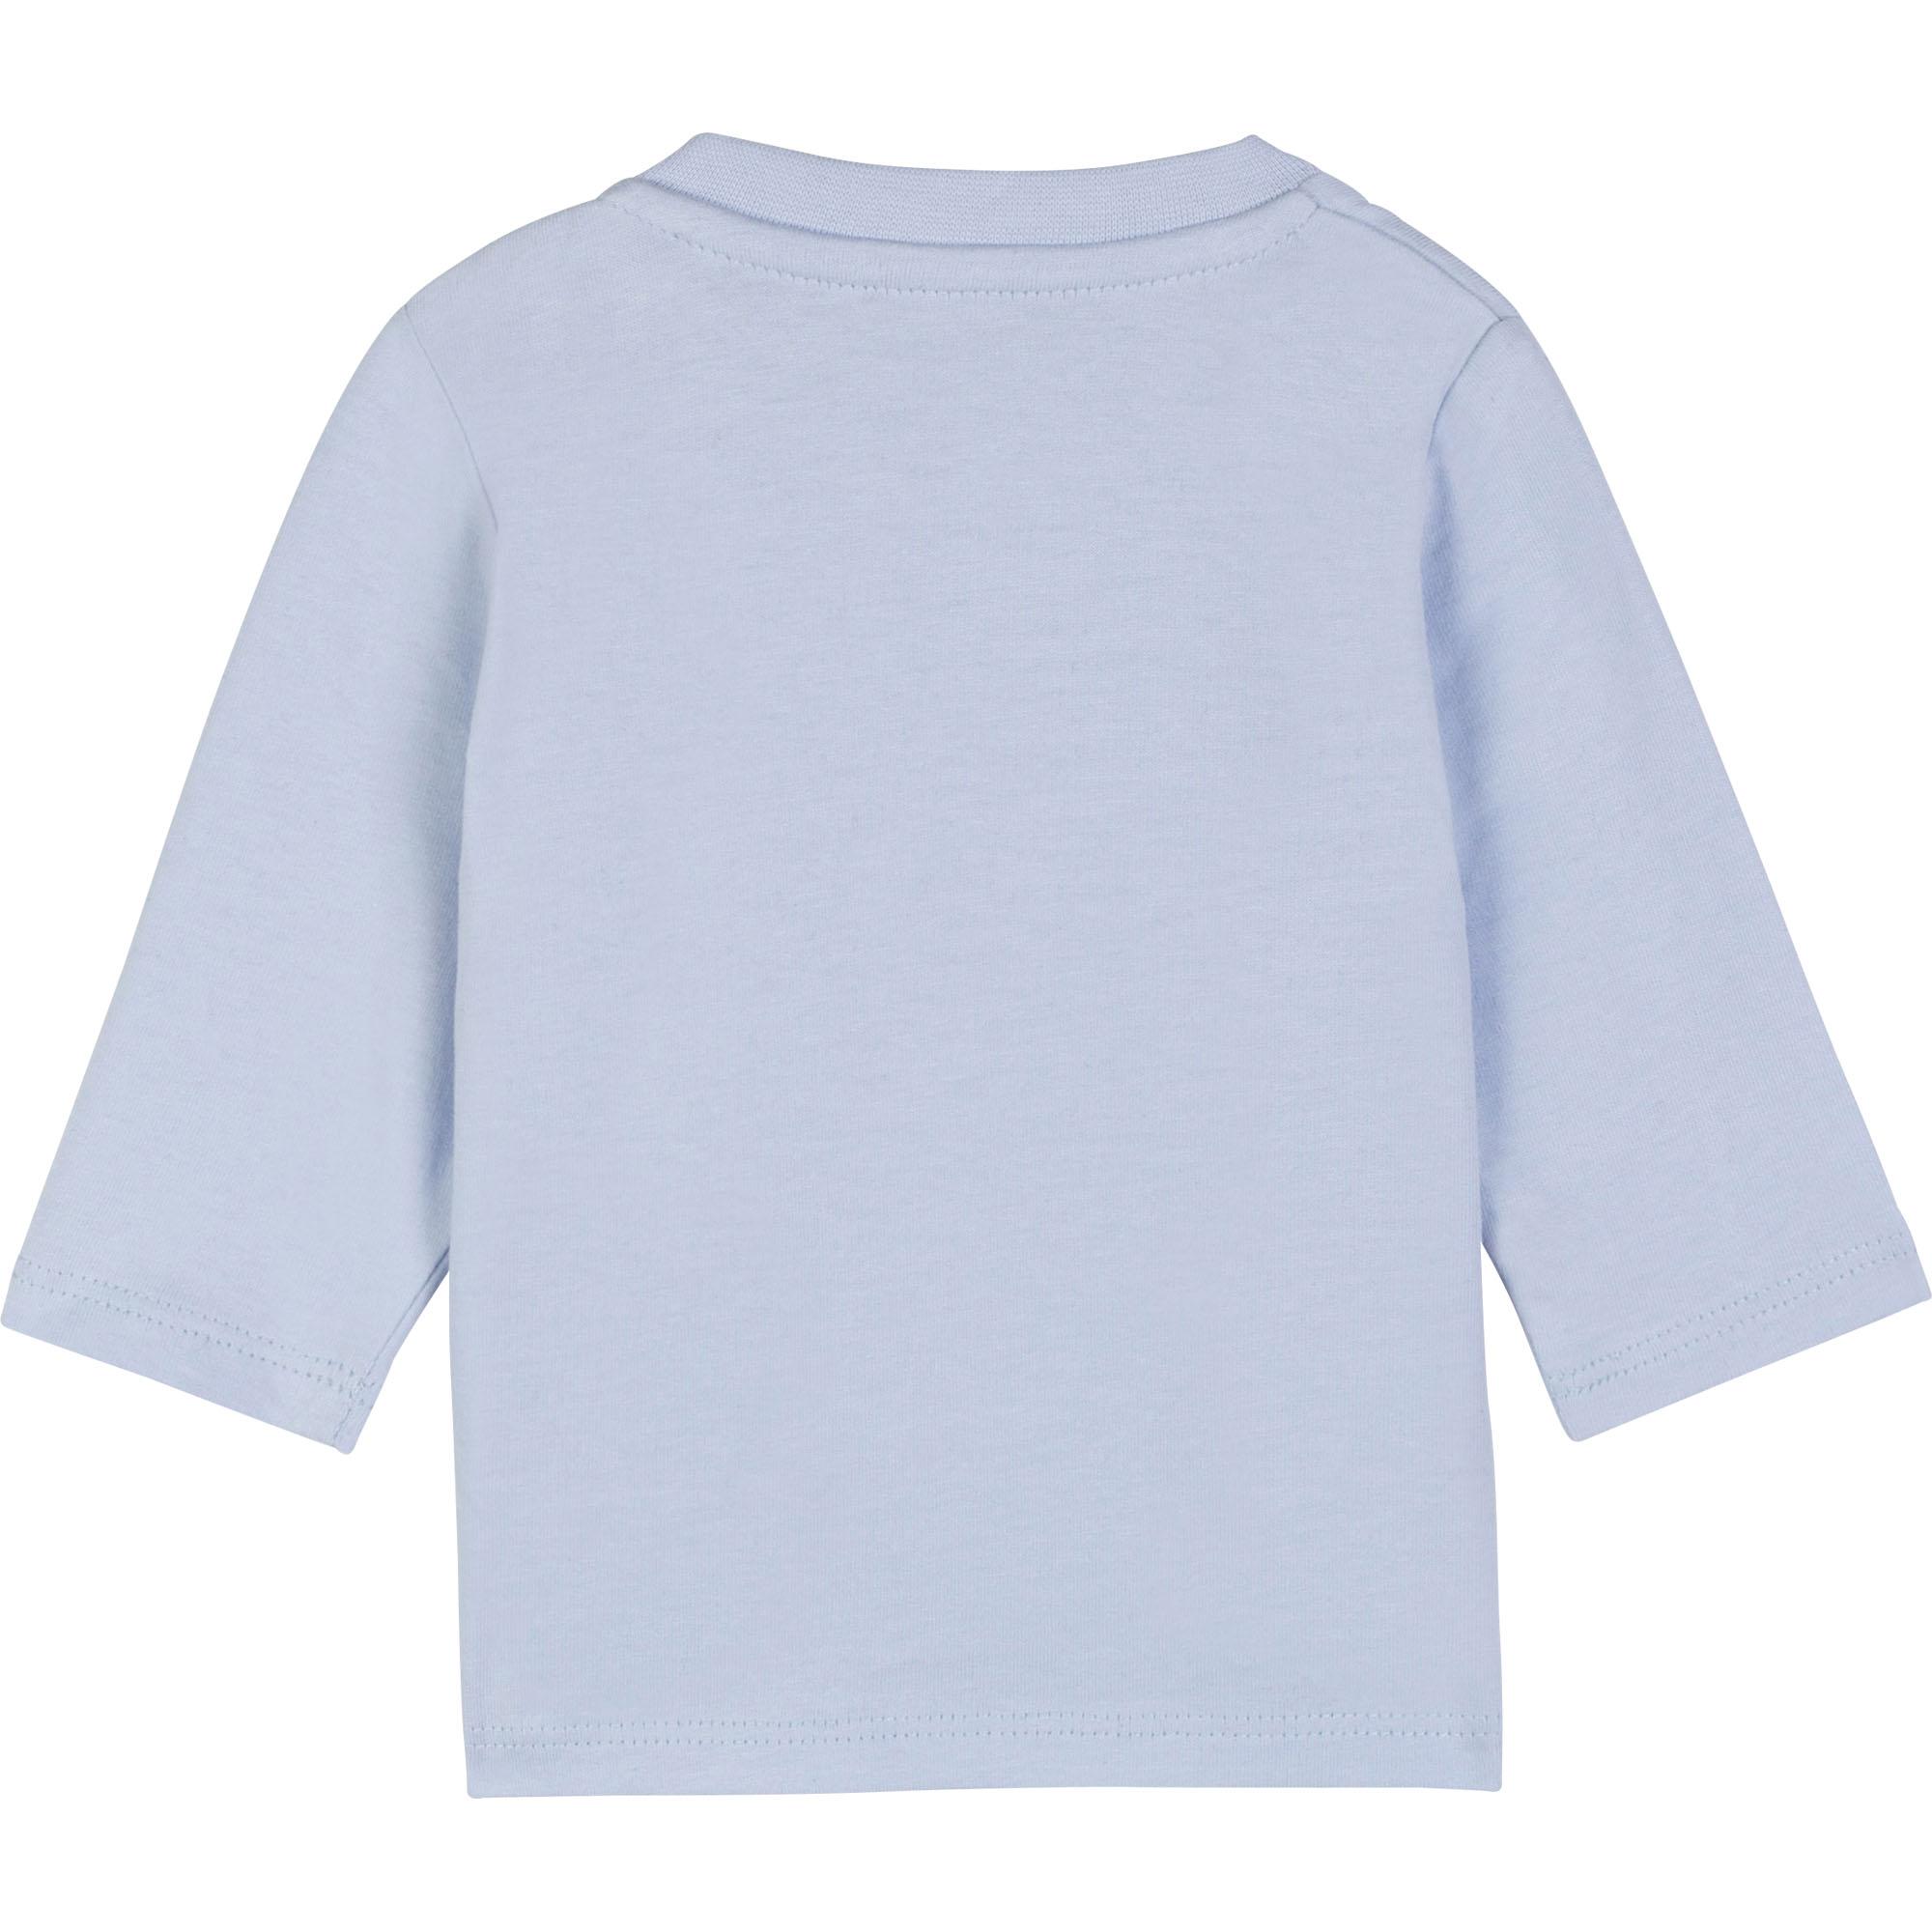 Long-sleeved T-shirt BOSS for BOY